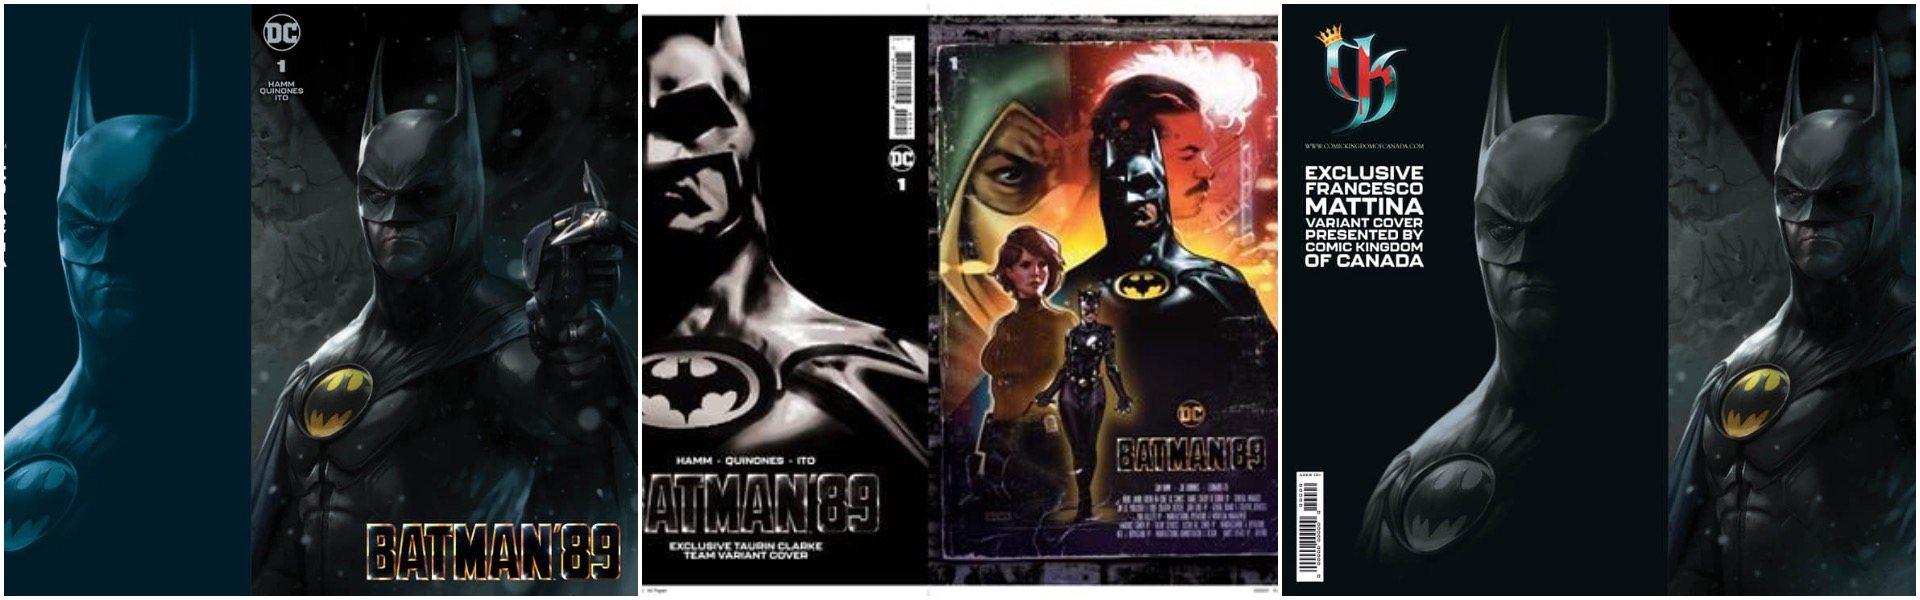 Step back into the Gotham of Tim Burton's seminal classic Batman movies!